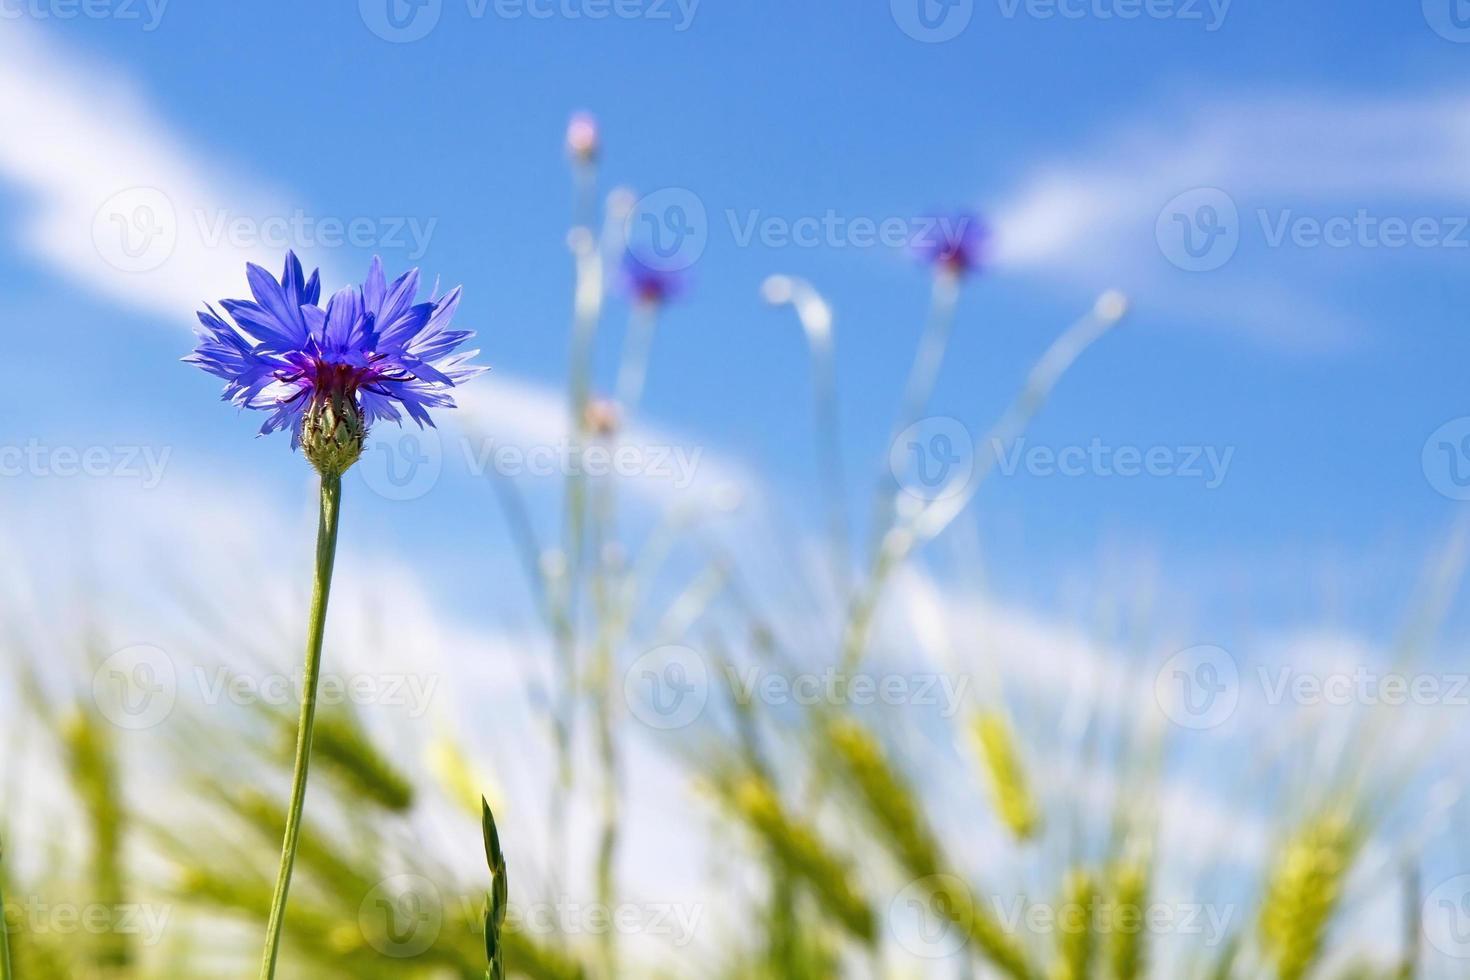 flores em flor (centaurea cyanus) foto